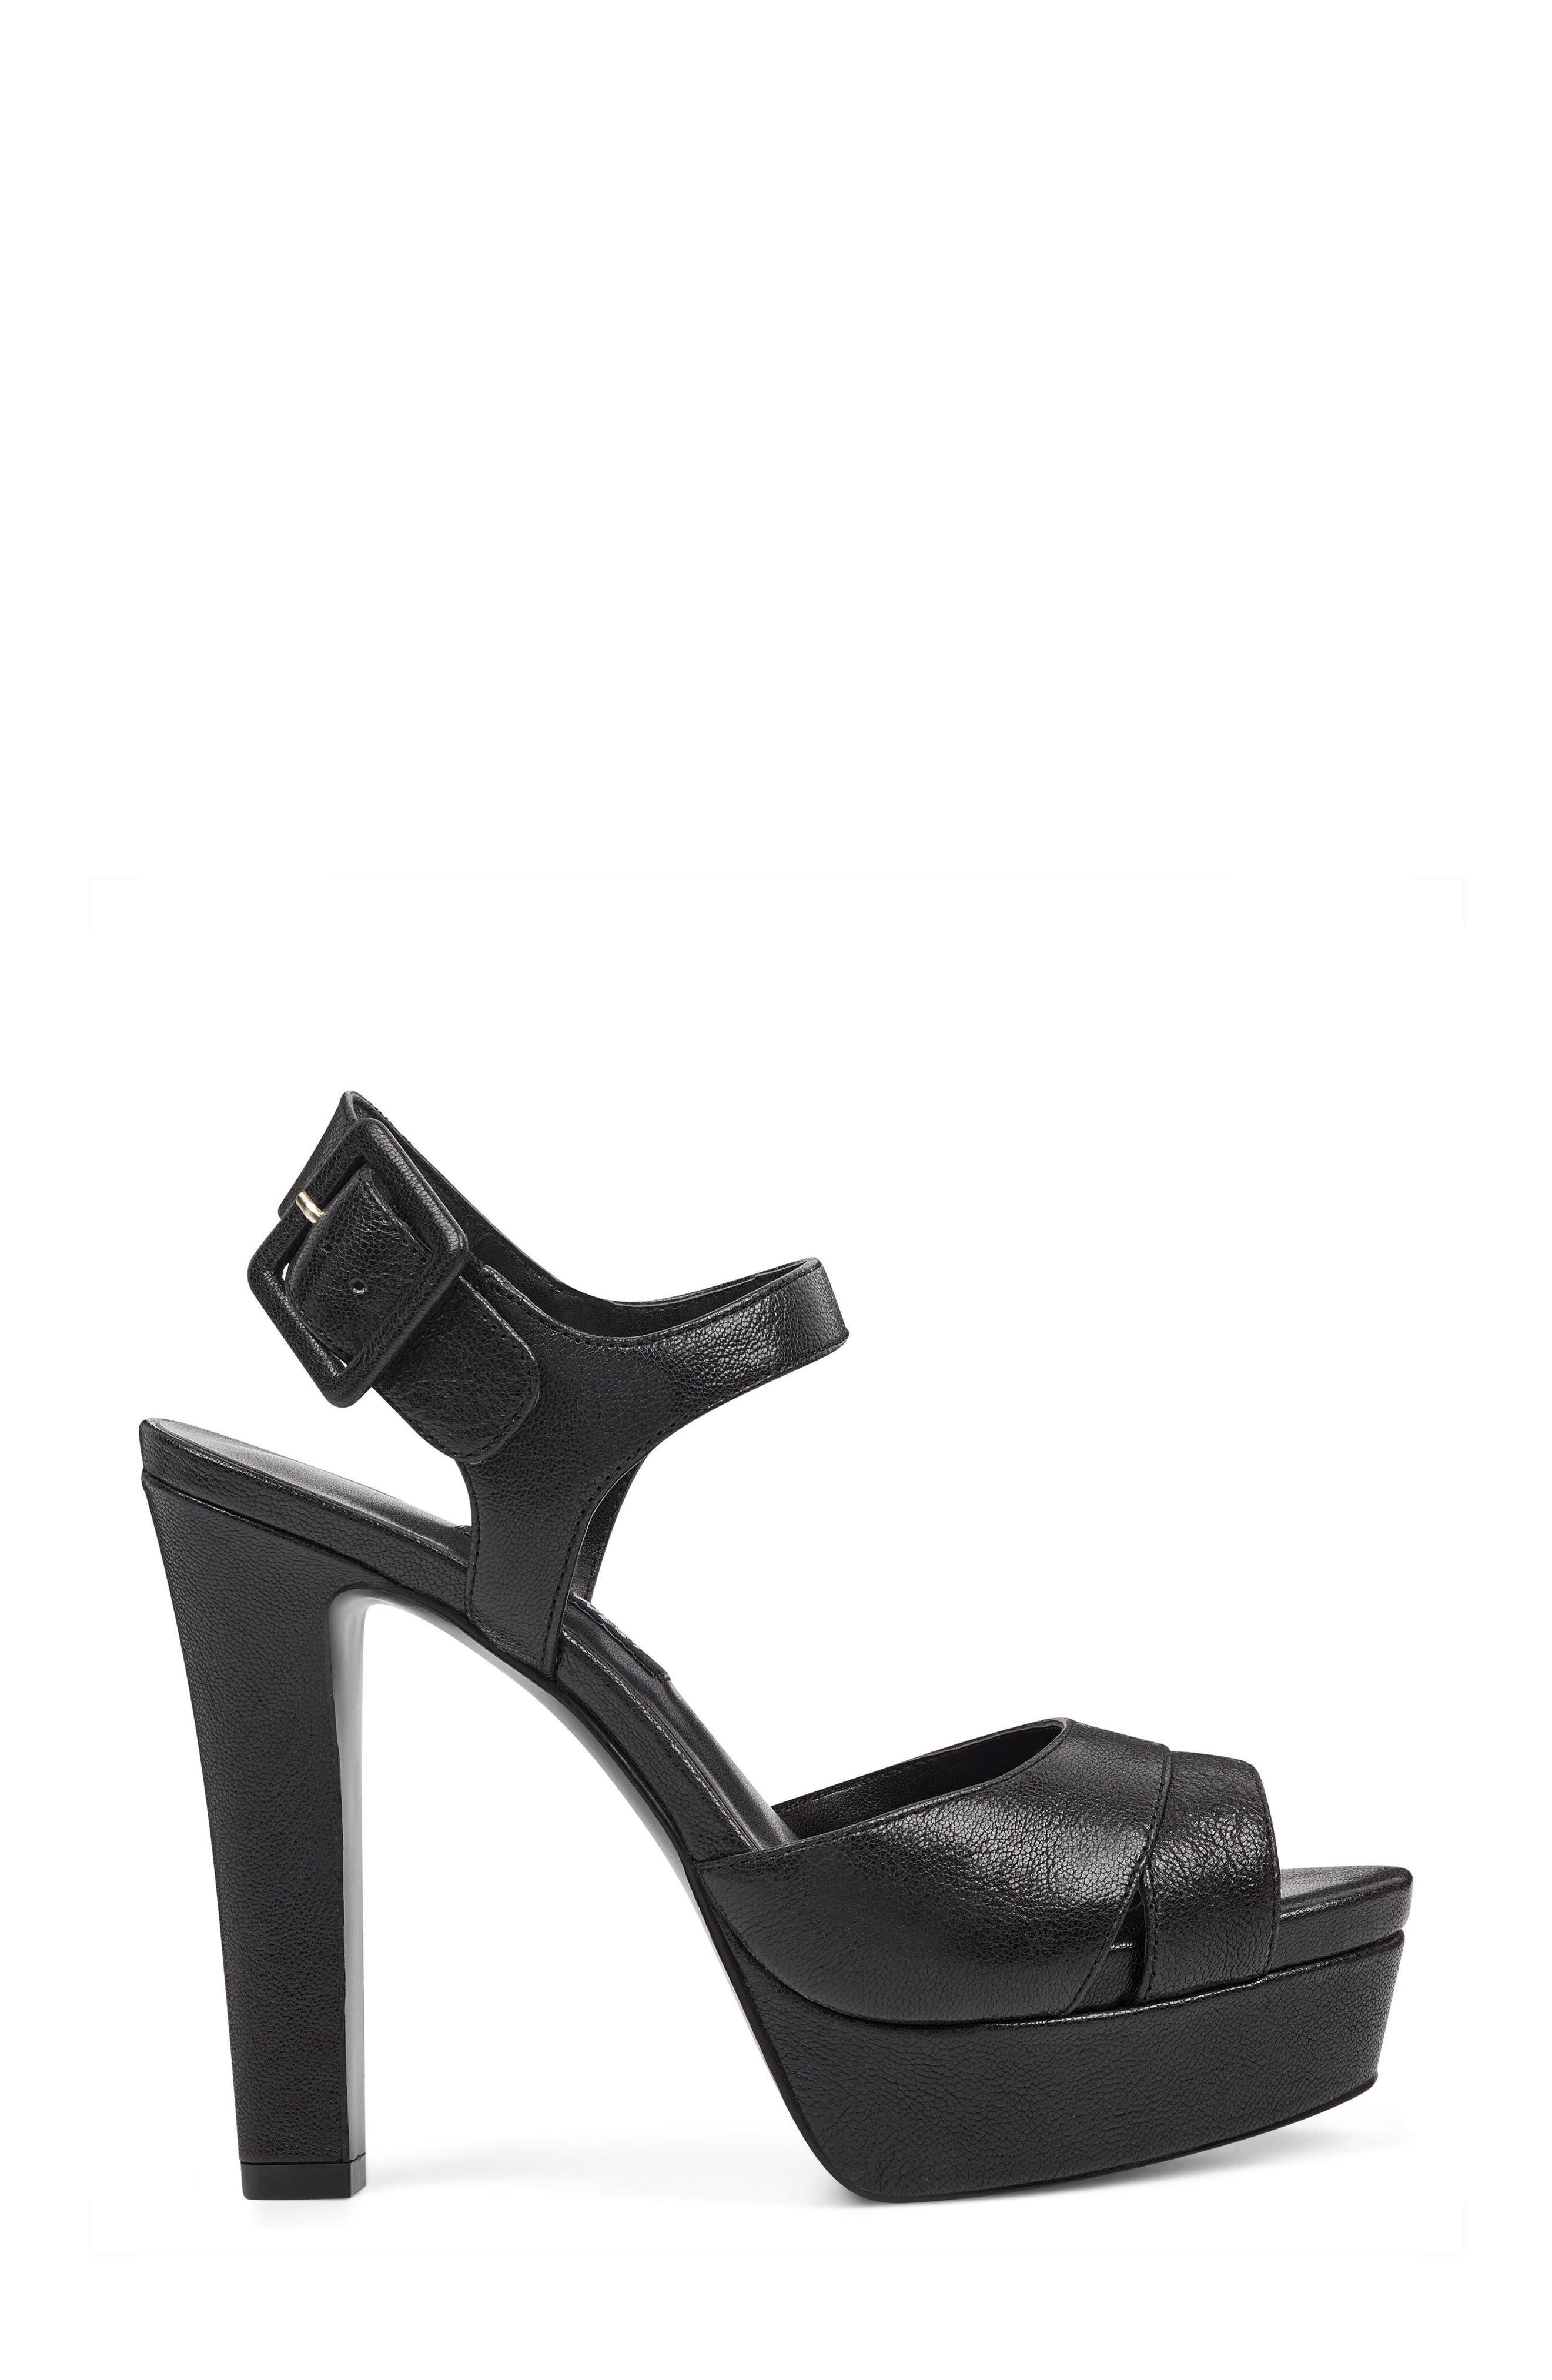 Ibyn Platform Sandal,                             Alternate thumbnail 3, color,                             Black Leather